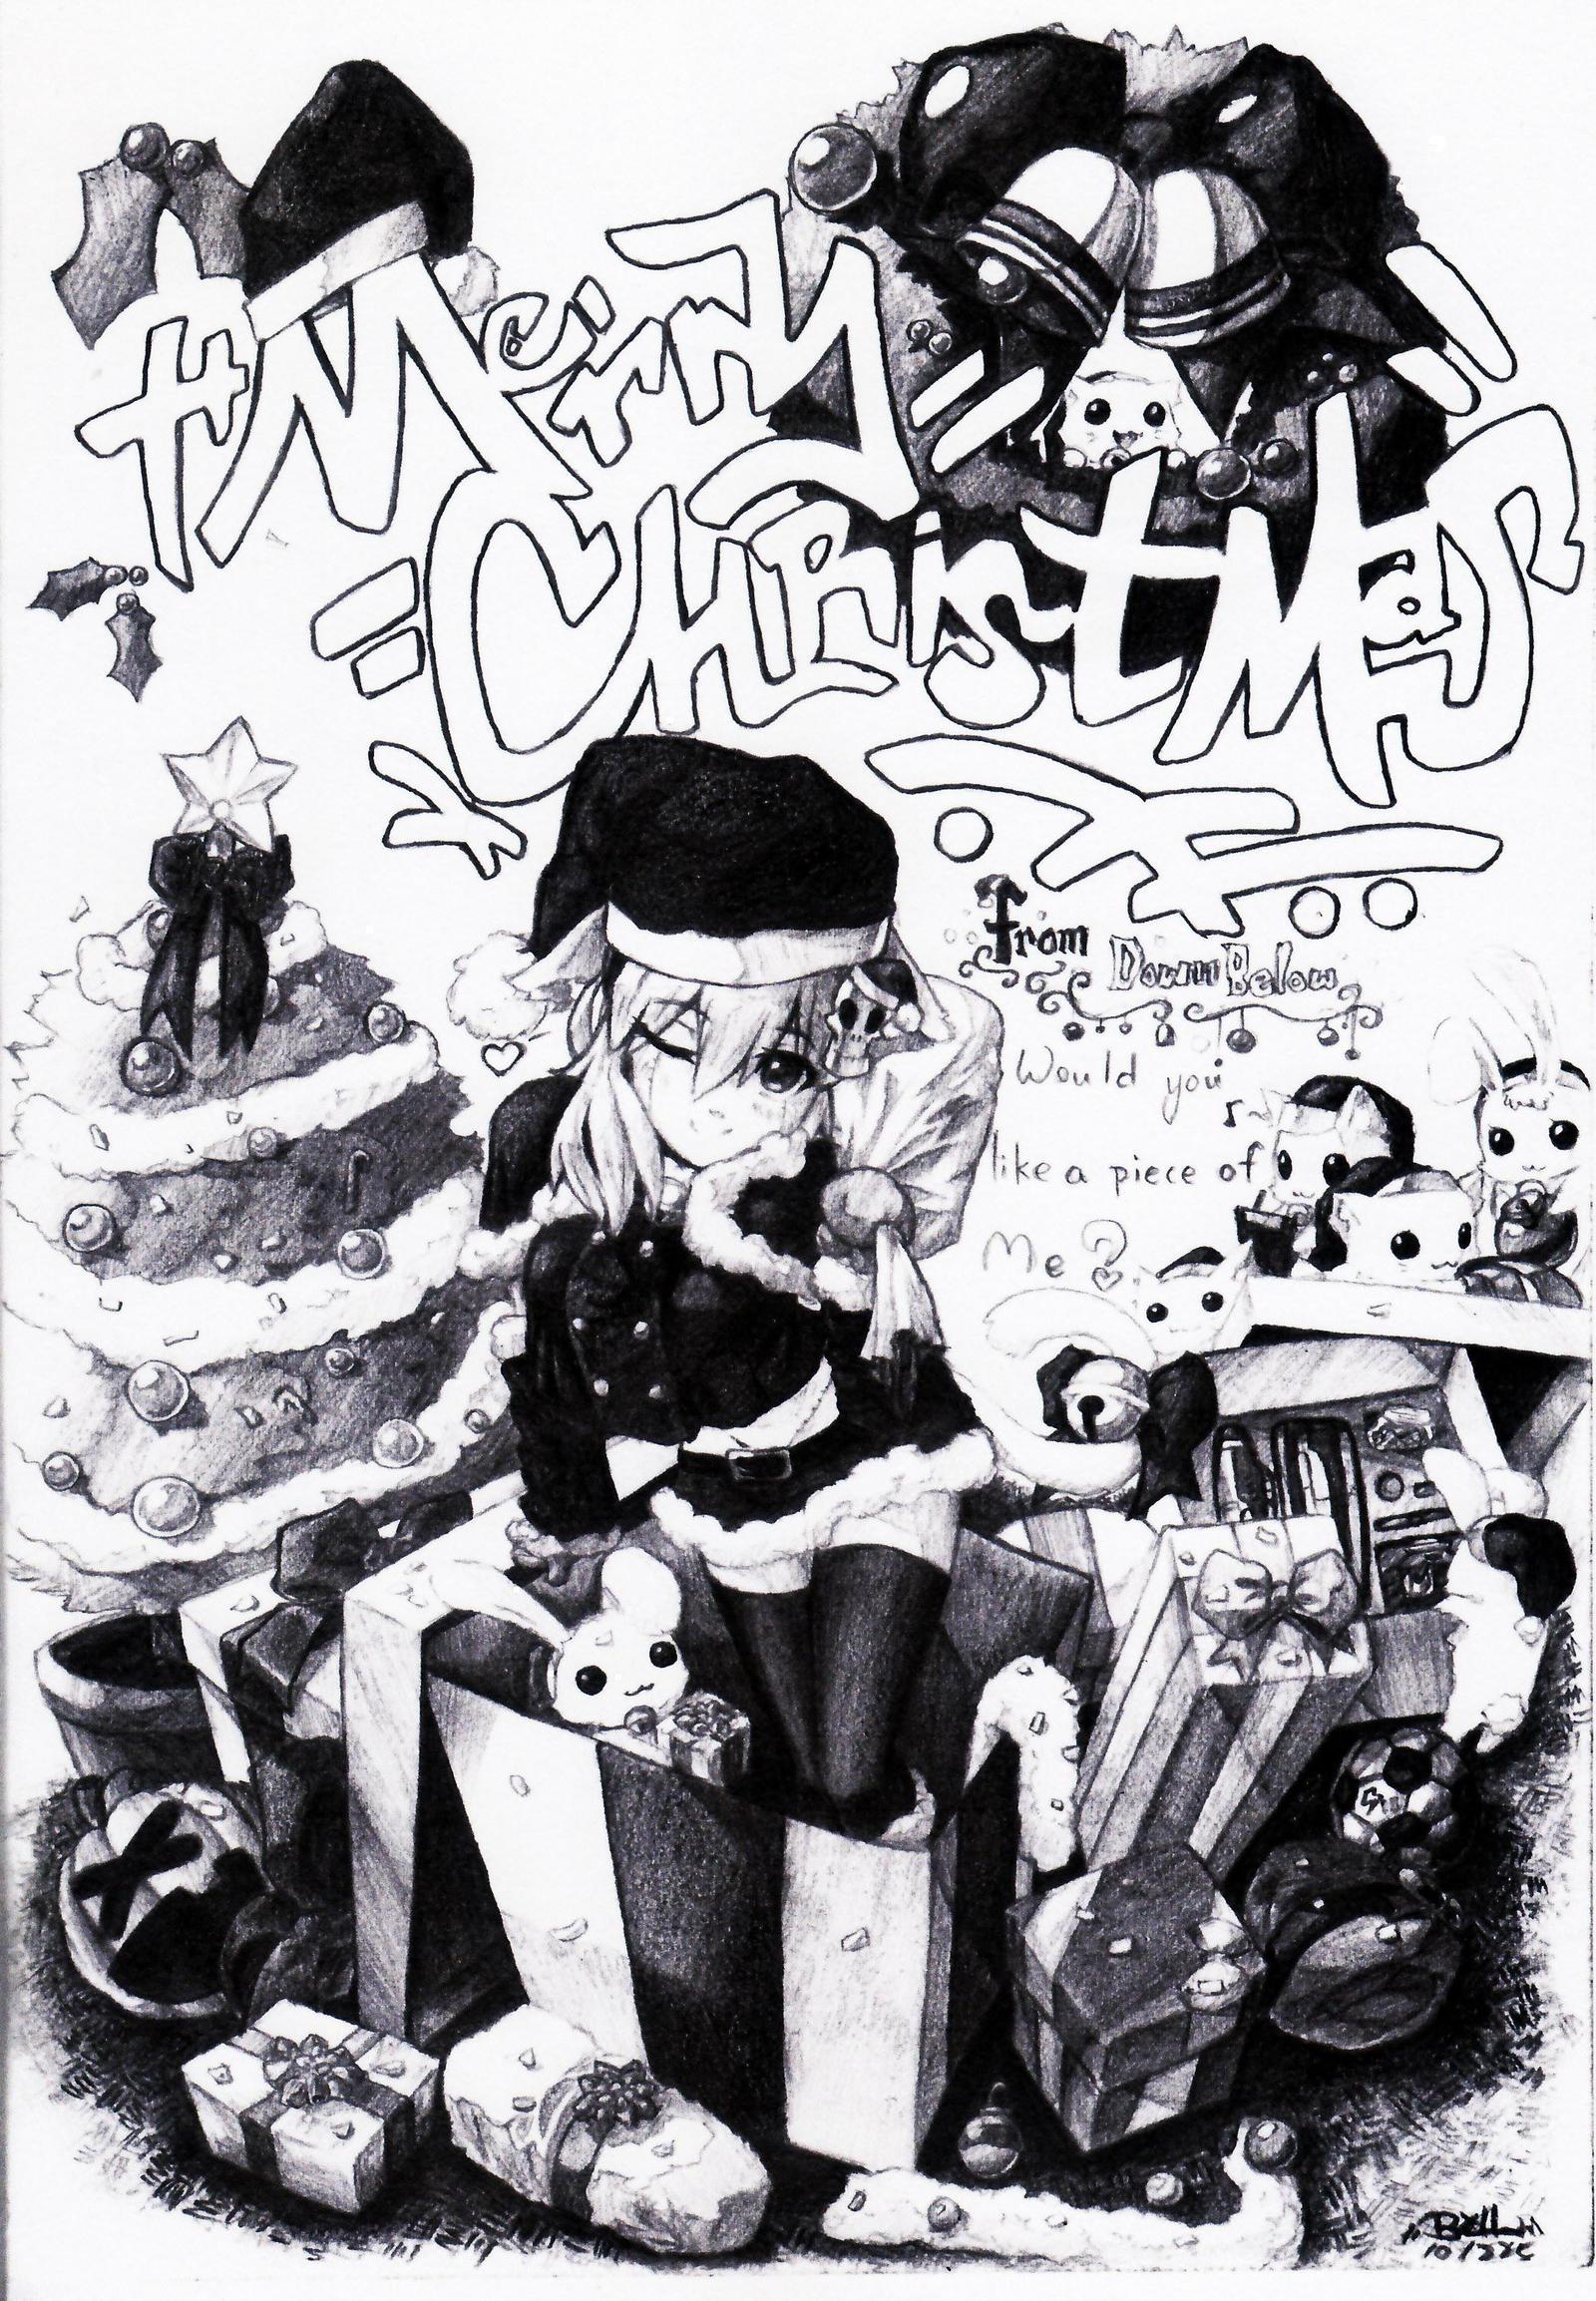 Merry X'mas from down below by ErMaoWu